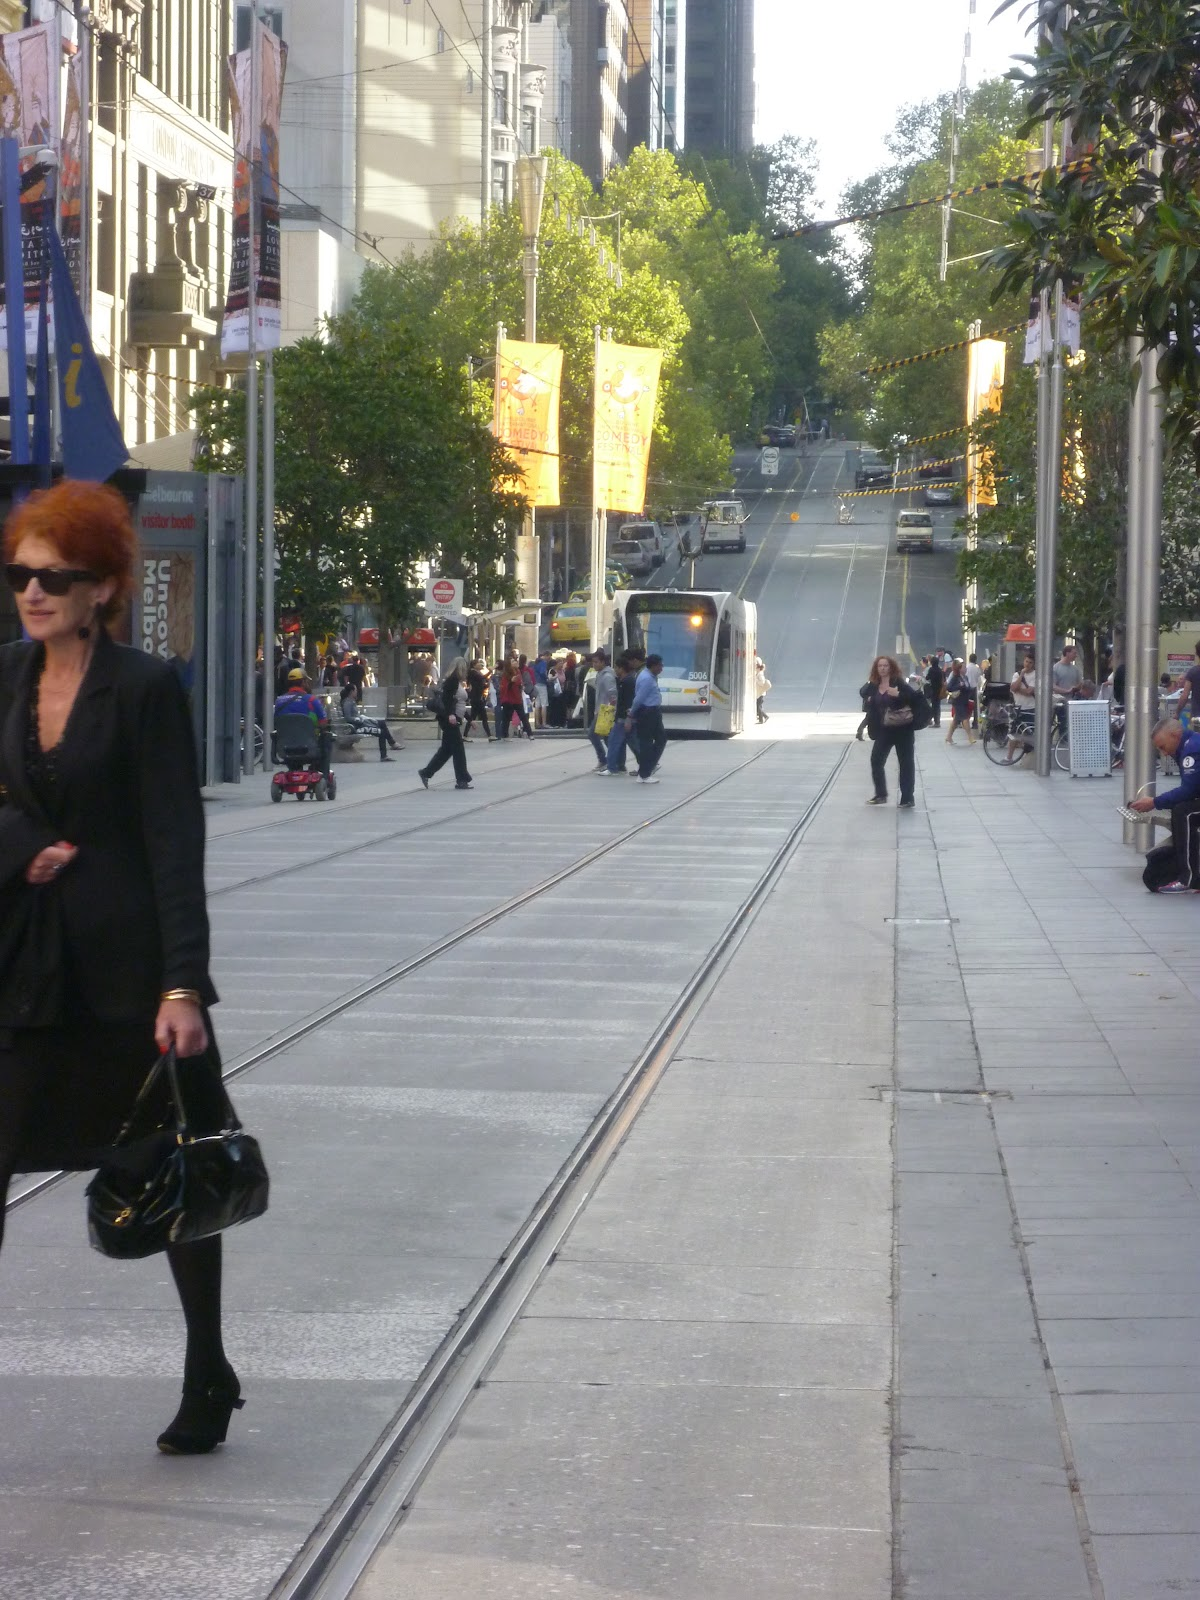 Date street in Melbourne